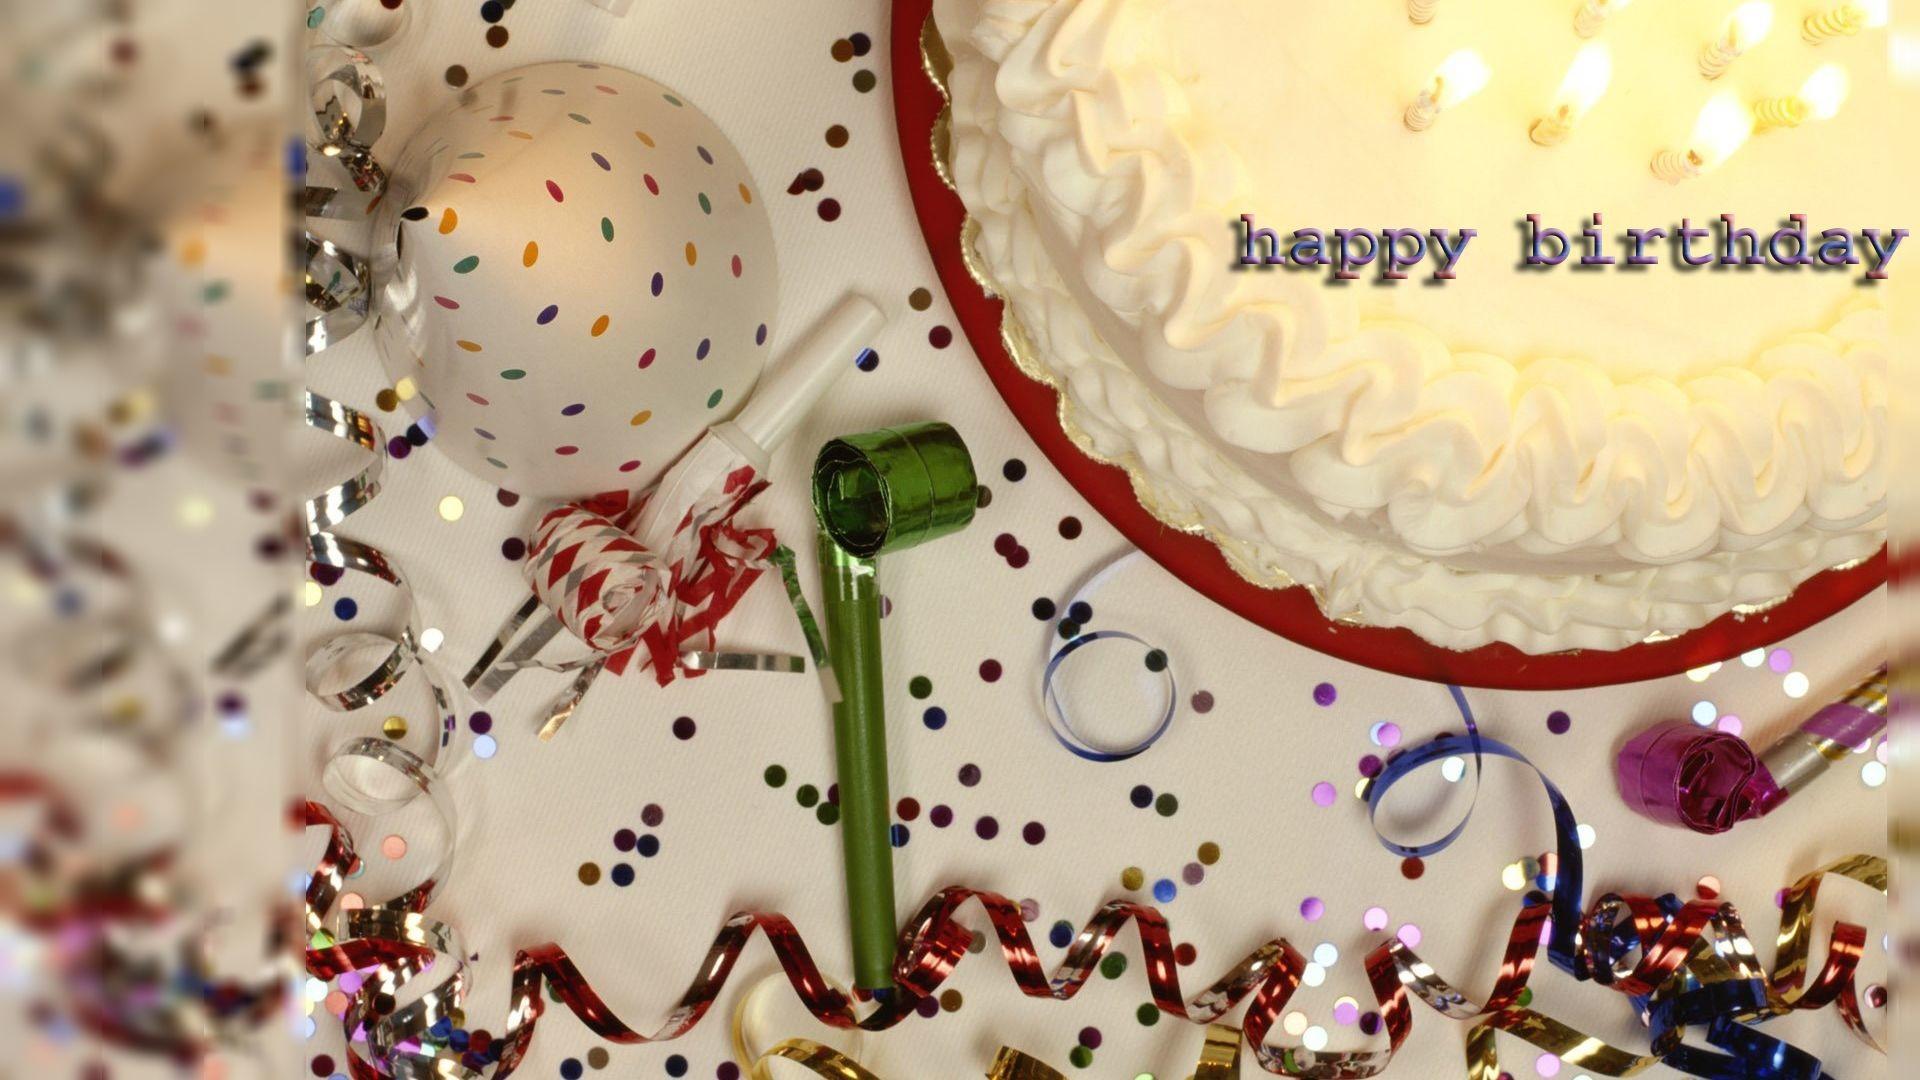 Happy Birthday Wishes Hd Wallpaper